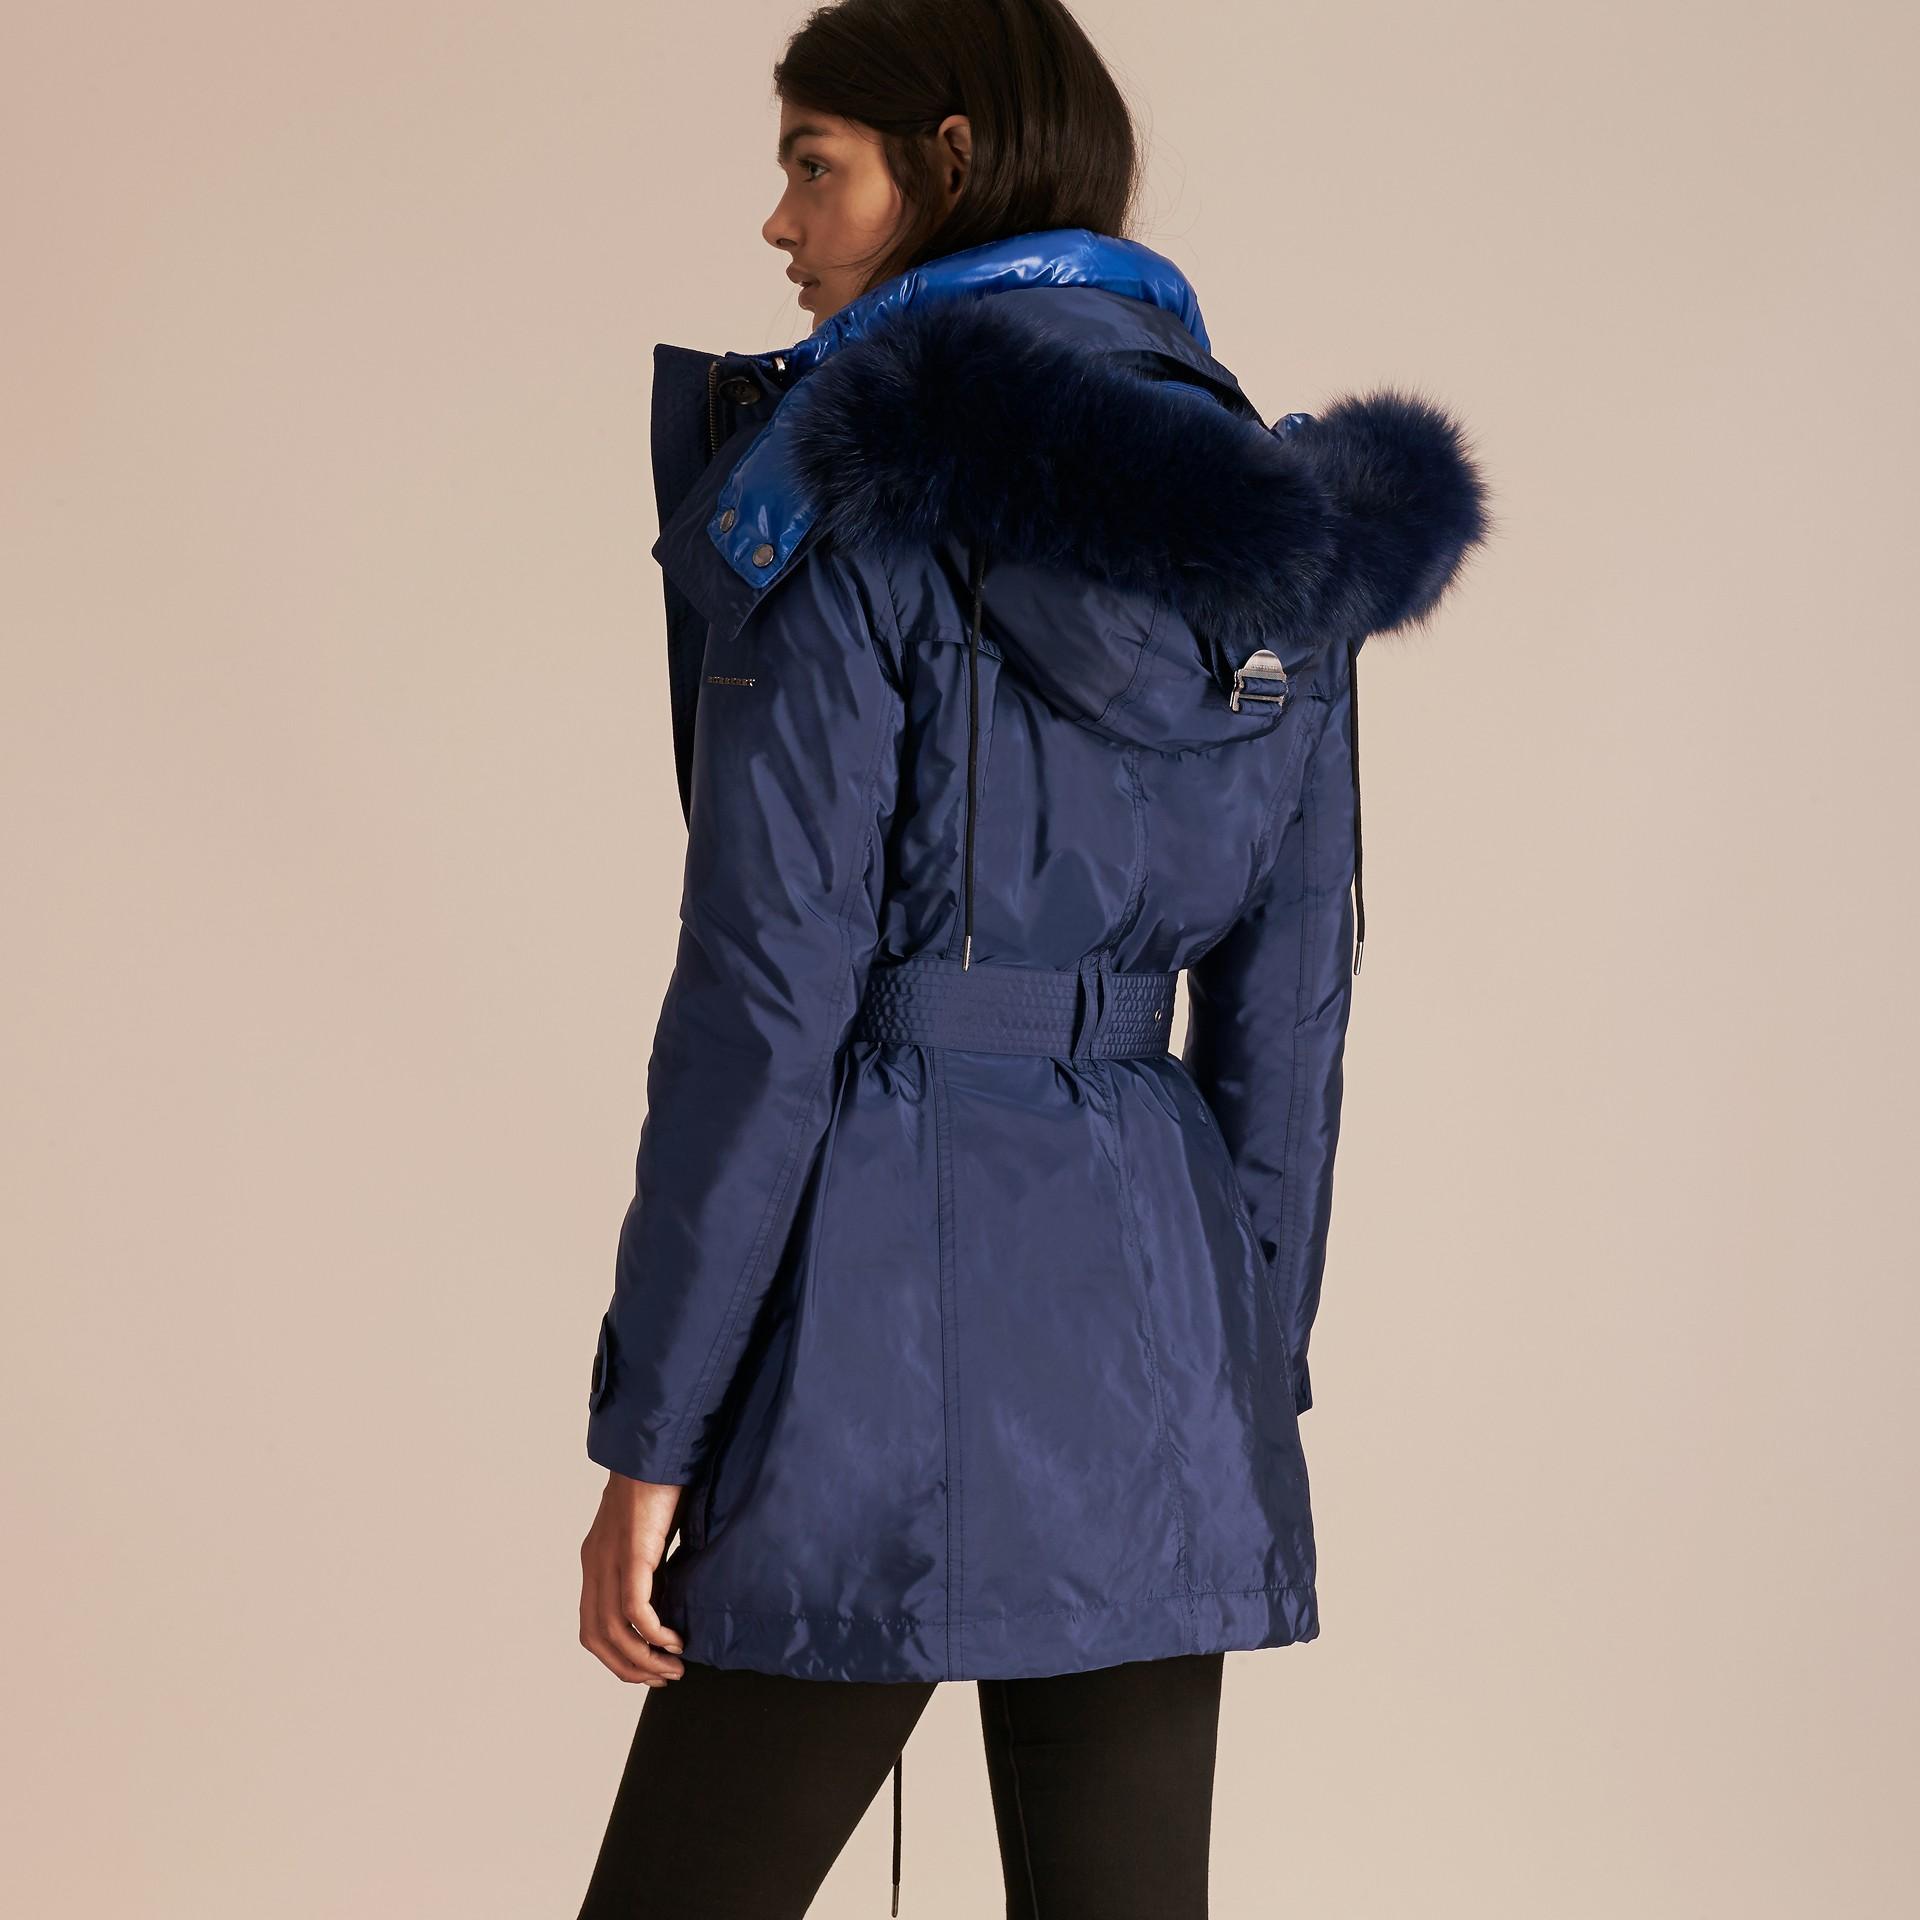 Ink blue Fur-trimmed Parka with Detachable Down-filled Jacket Ink Blue - gallery image 3